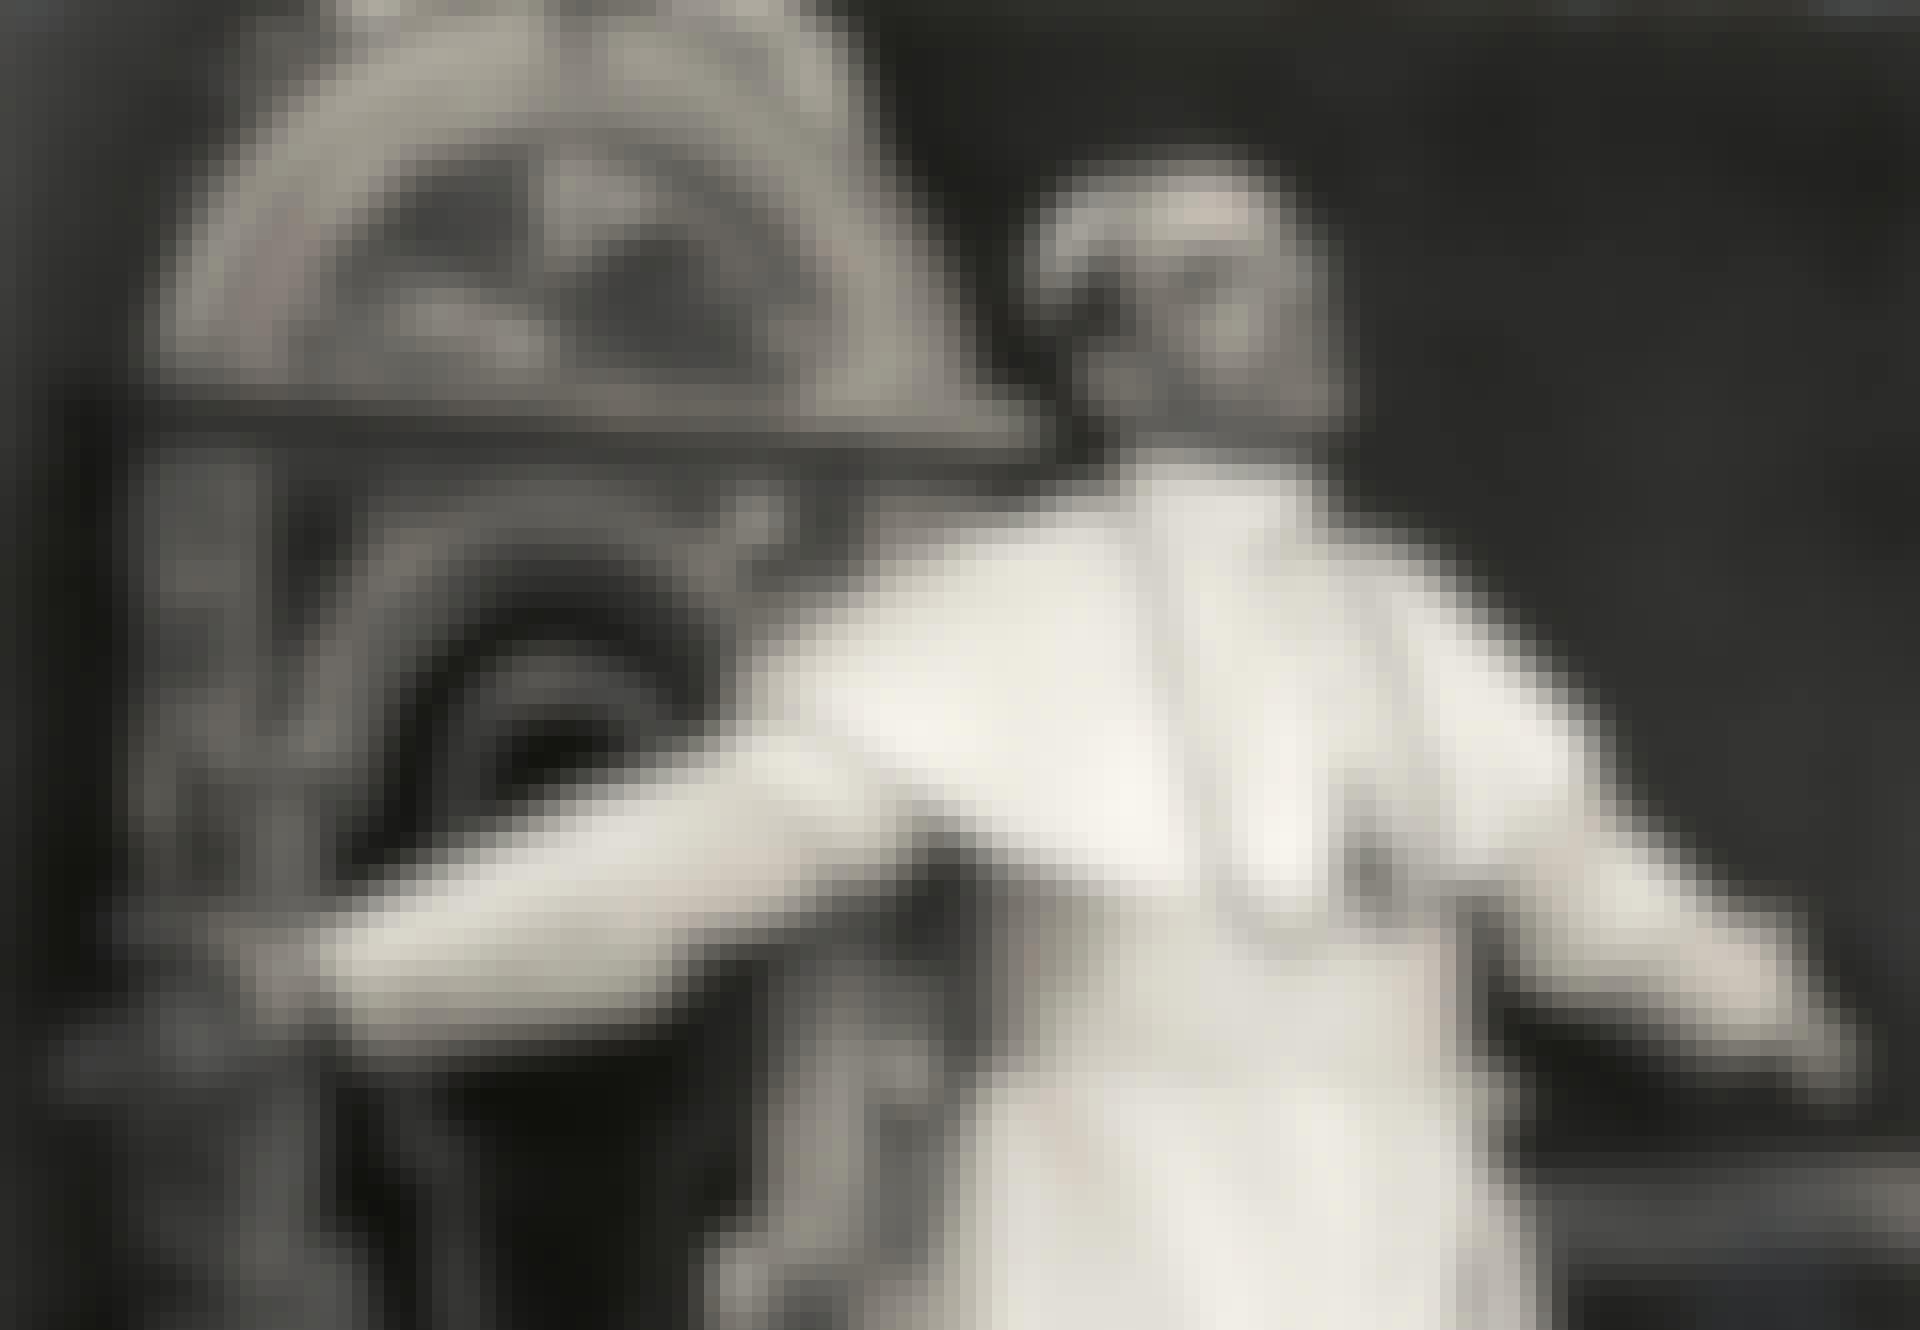 Pius 12 Holocaust vatikanet